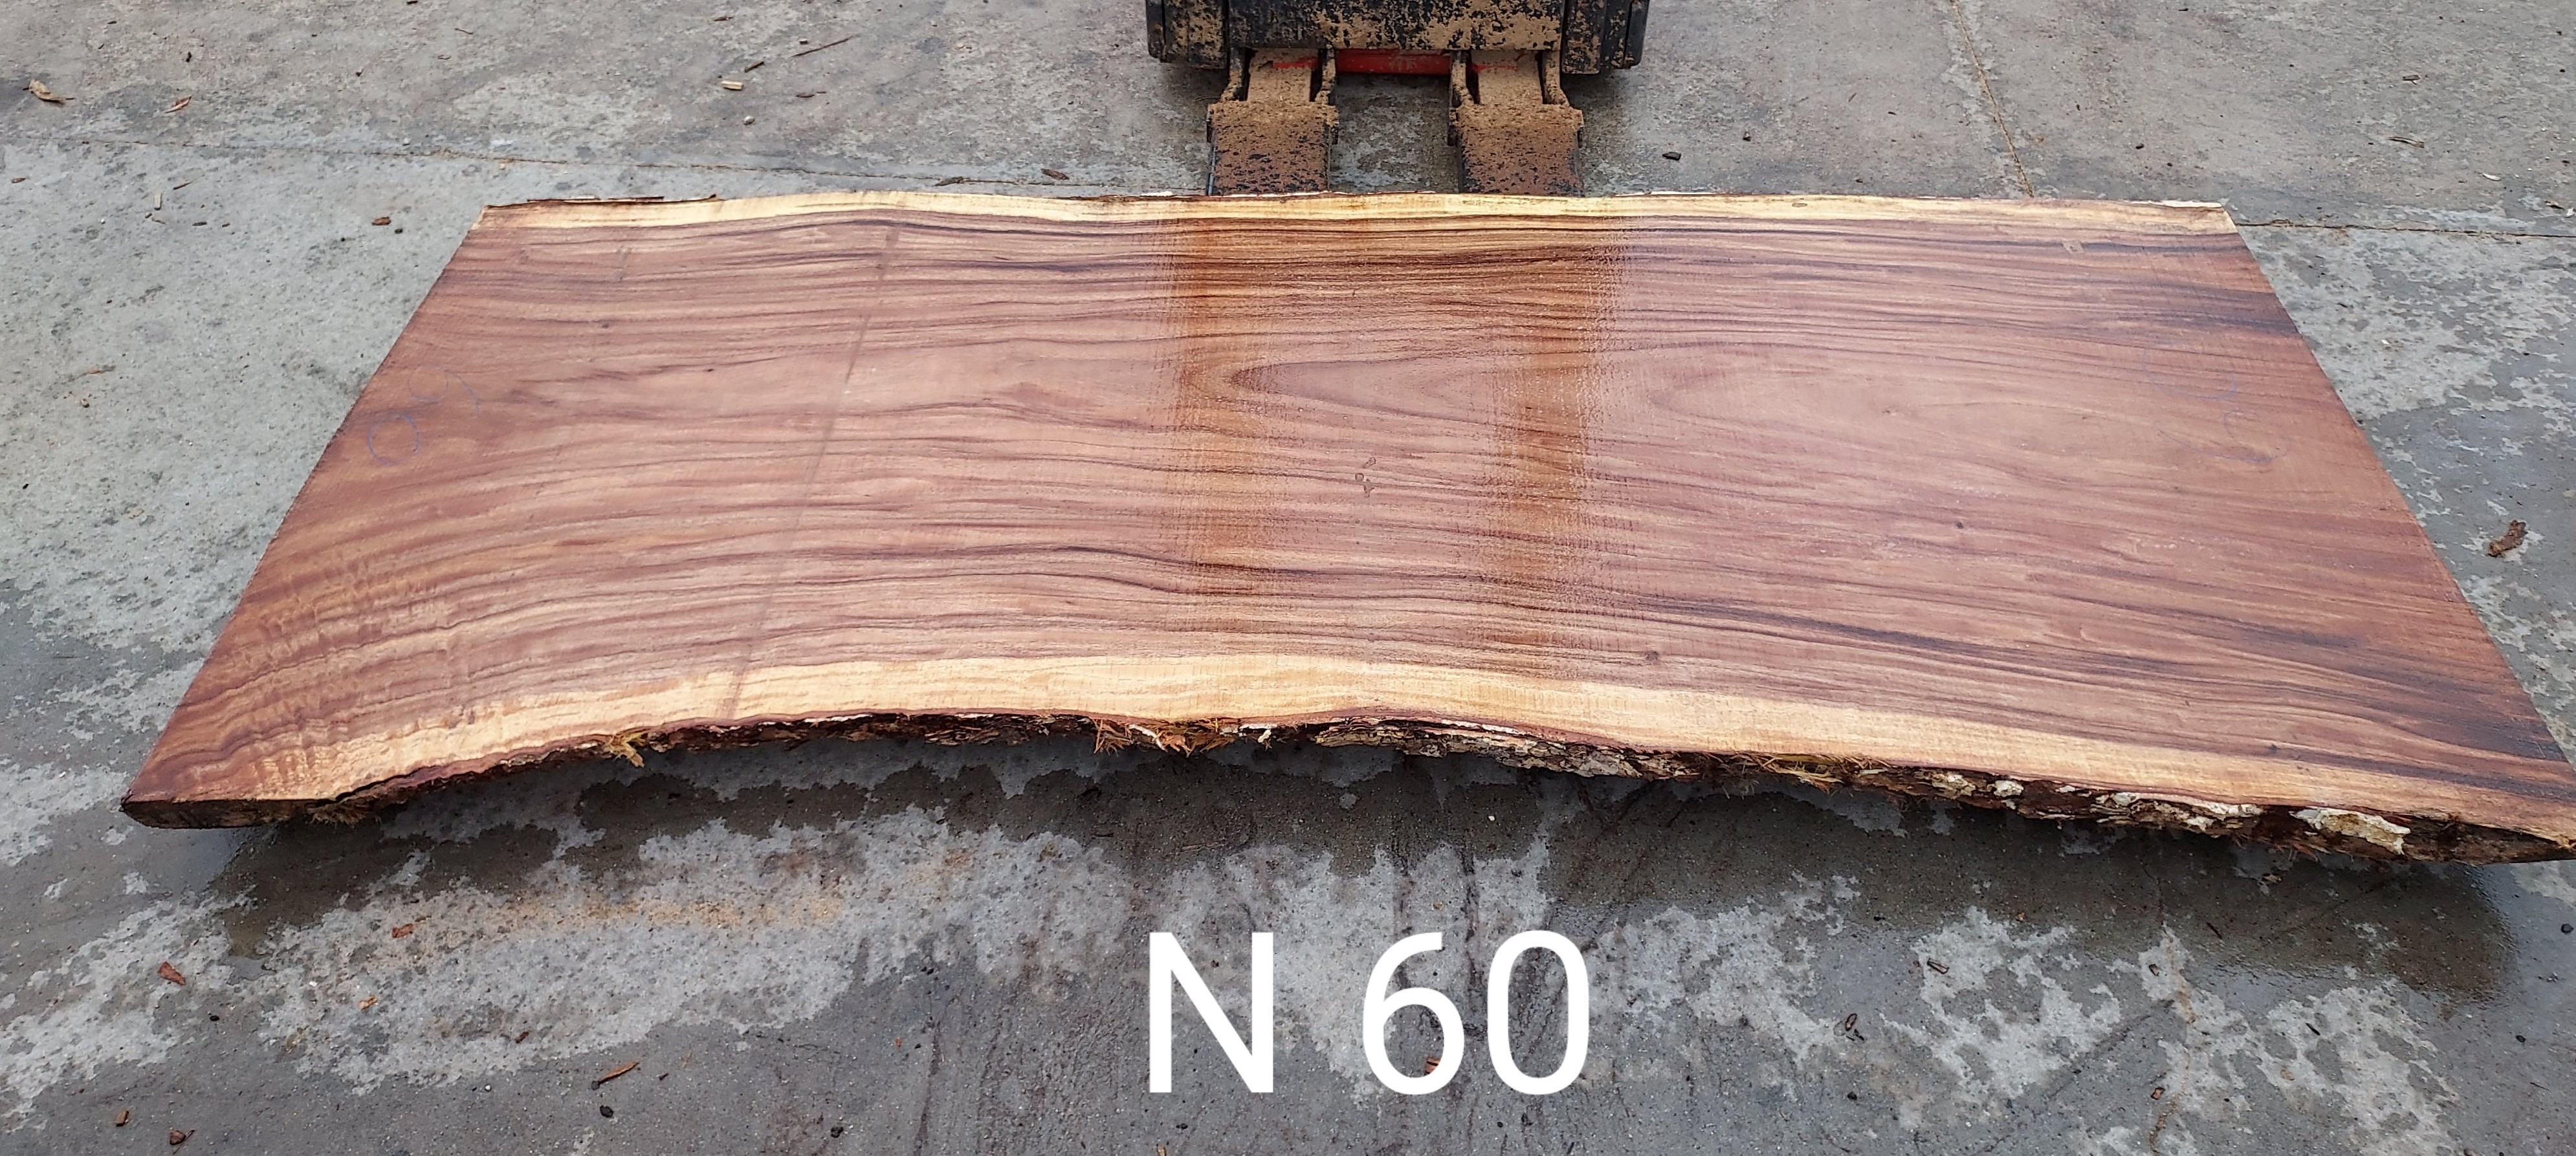 N 60 ANCHO